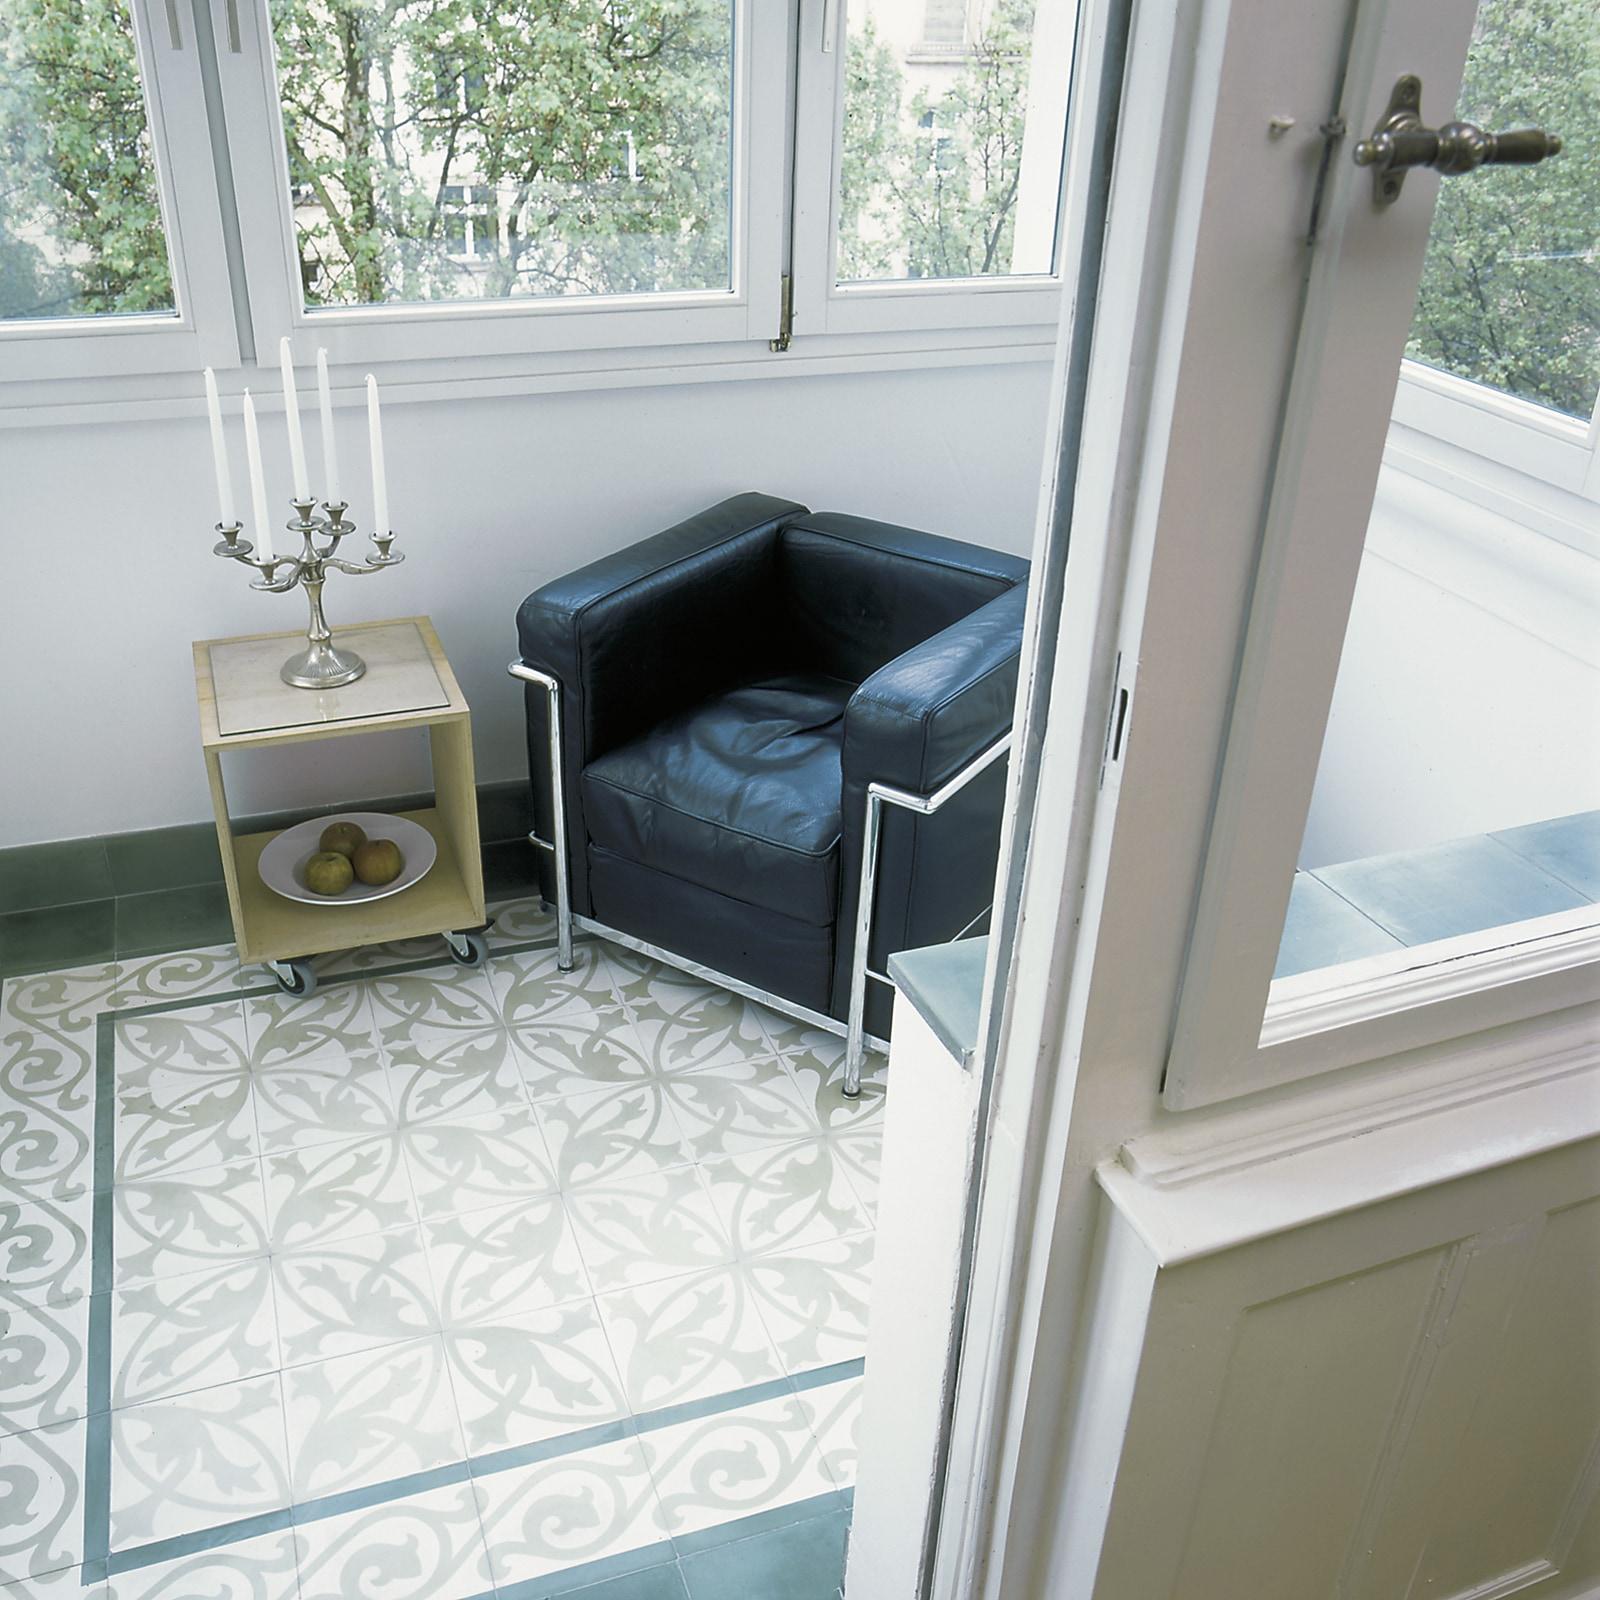 zementmosaikplatte-nummer-10821-wintergarten-LC-via-gmbh | 30521